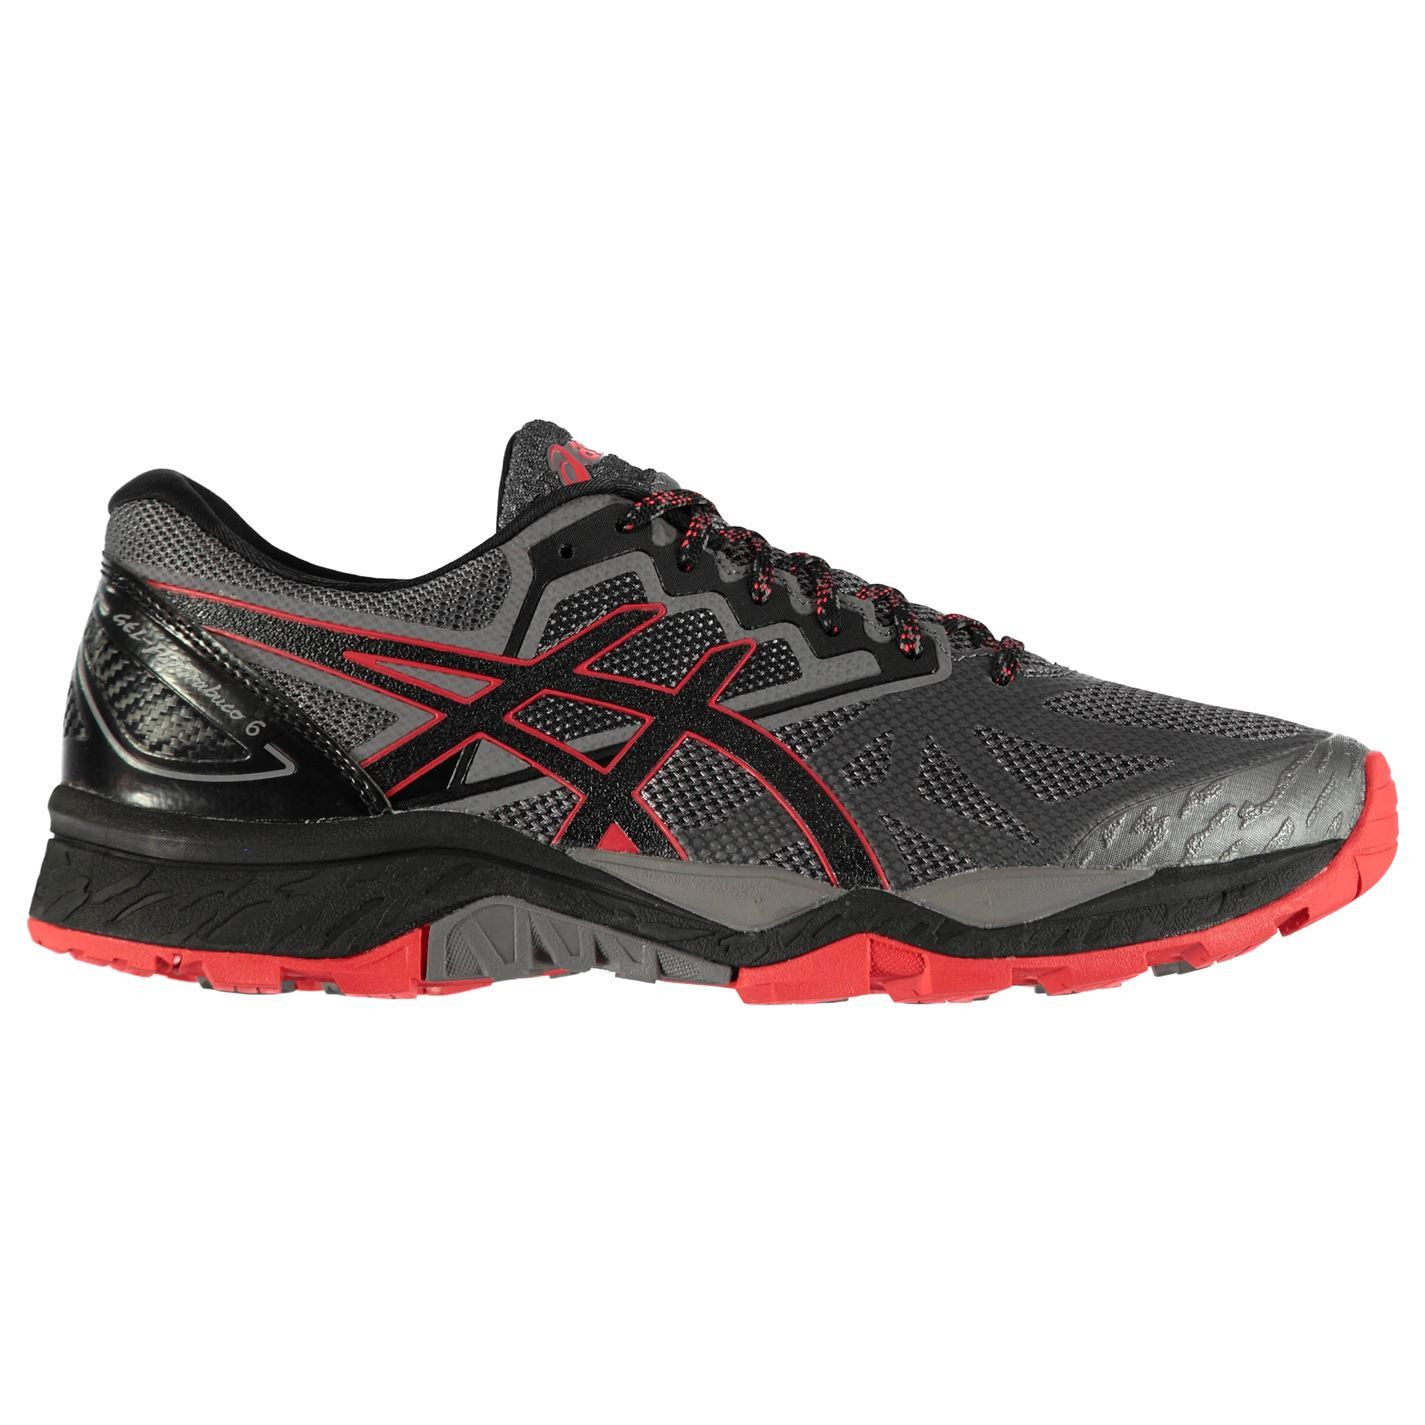 Asics  Herren Fujitrabuco 6 Trail Running Lightweight Schuhes Lightweight Running Studs fc8f2a